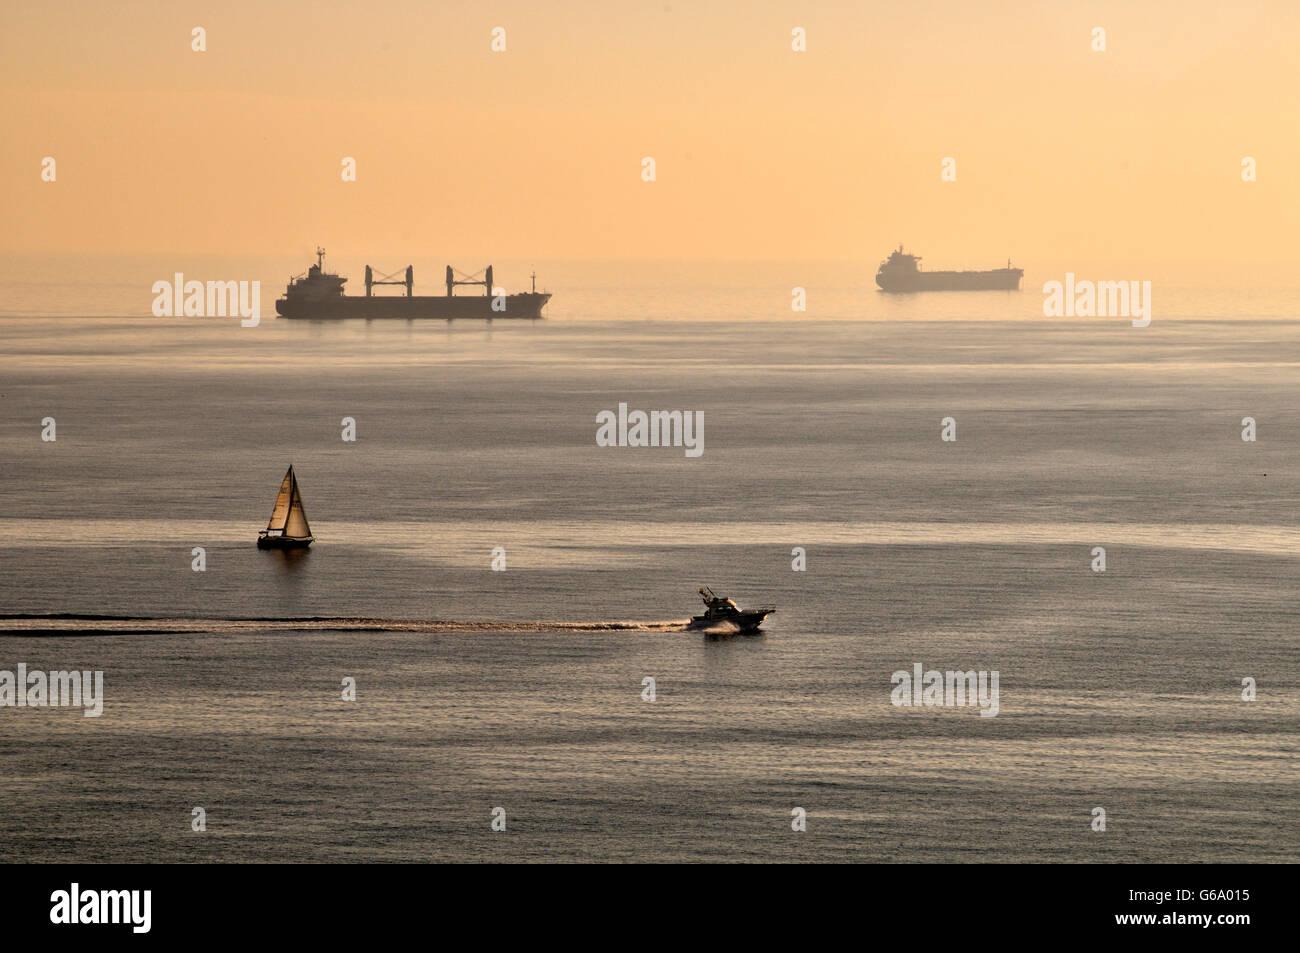 Four boats front the city of Tarragona (Catalonia), Spain. - Stock Image